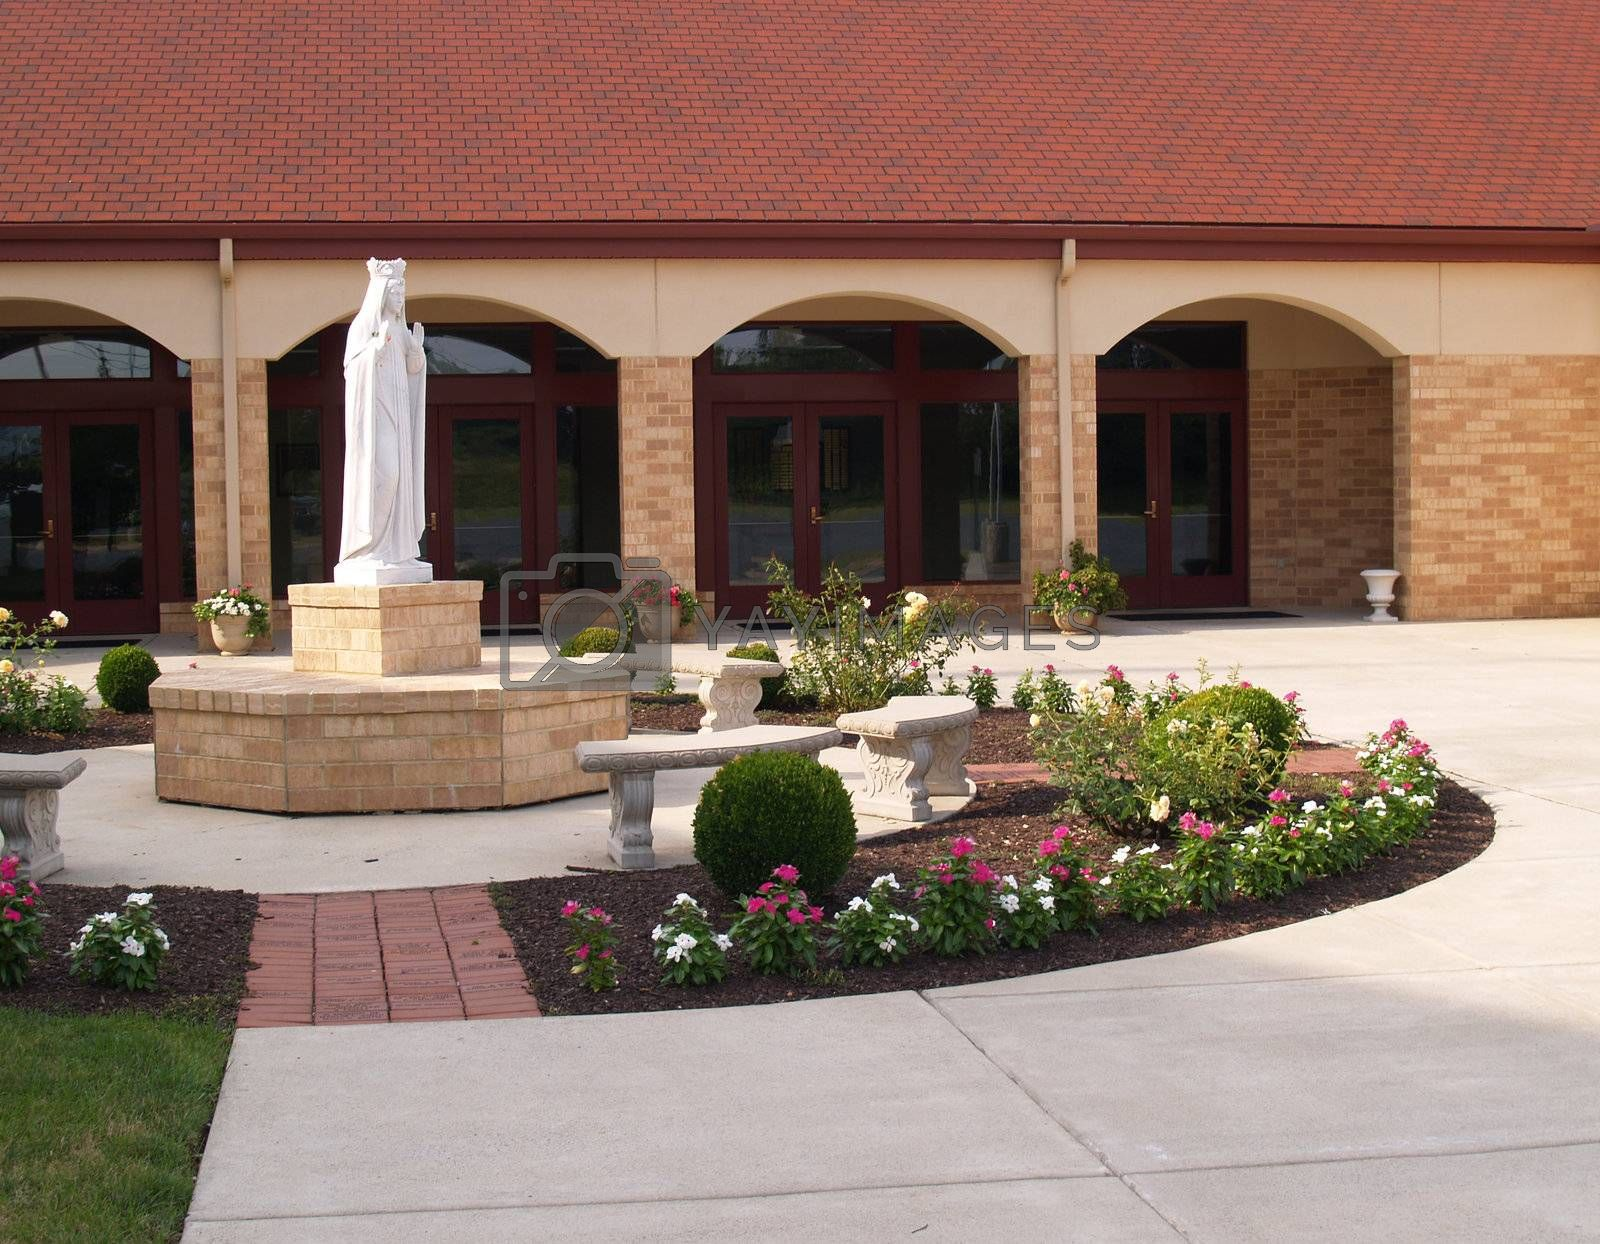 a religious statue outside a brick church